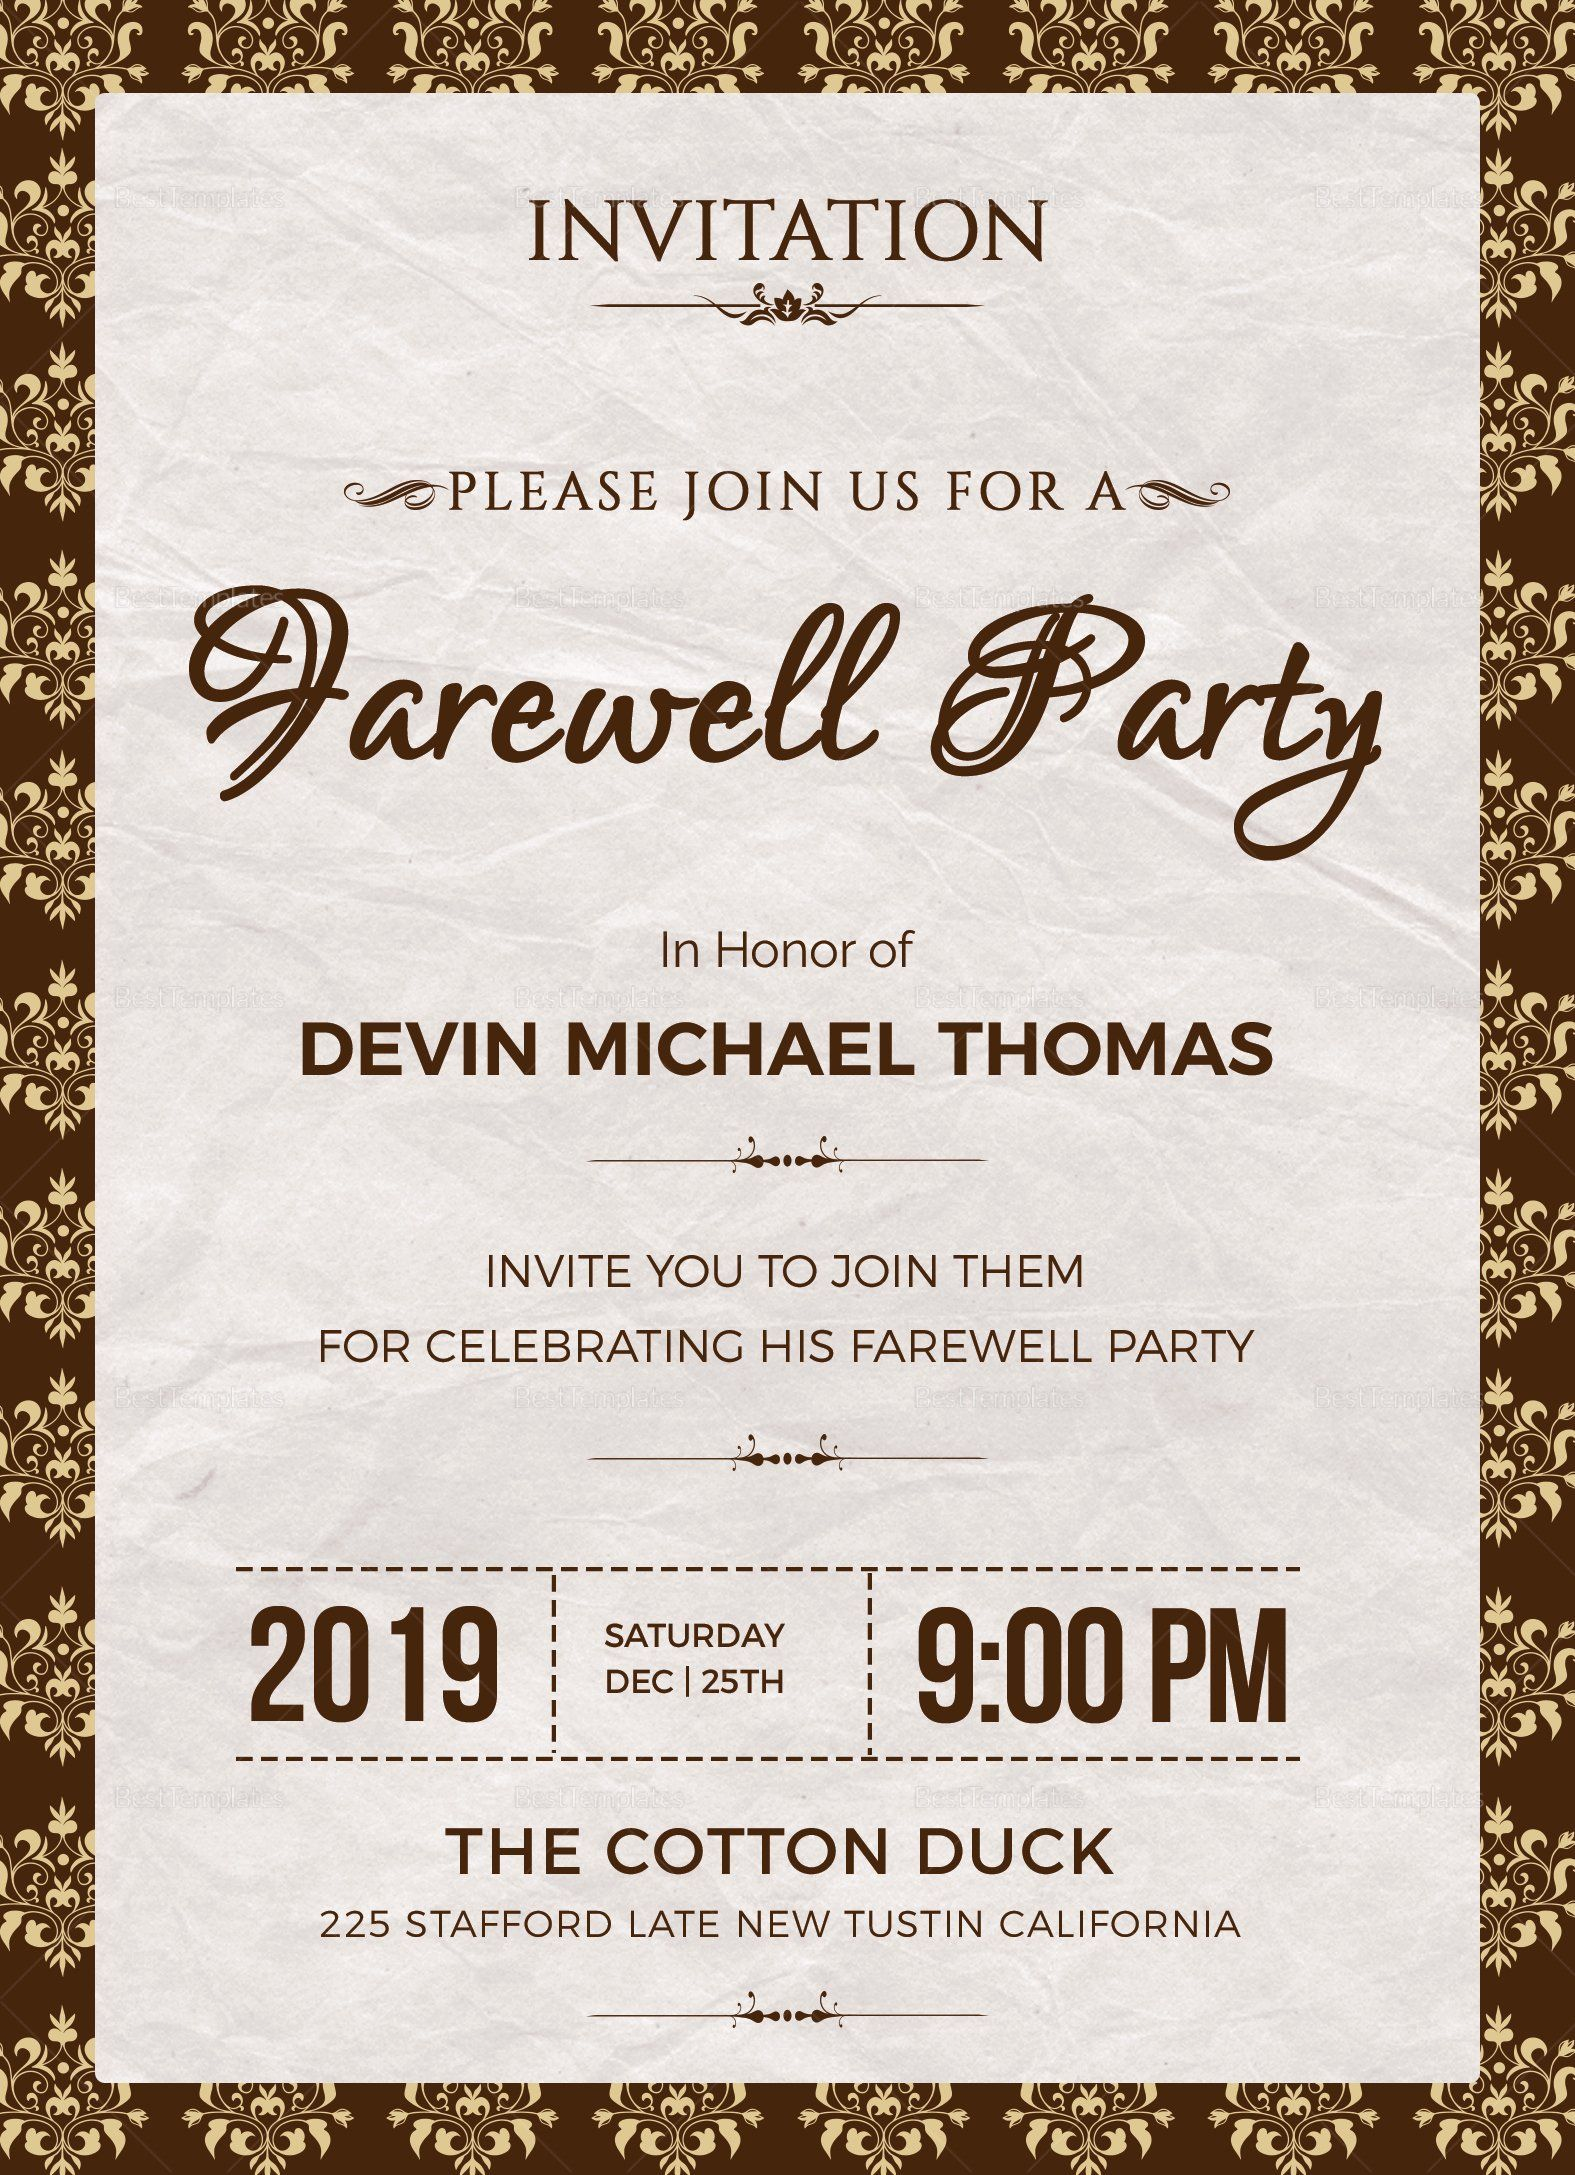 Farewell Invitation Template Free Fresh Farewell Invitation Design Template In Word Psd In 2020 Farewell Invitation Farewell Party Invitations Farewell Invitation Card